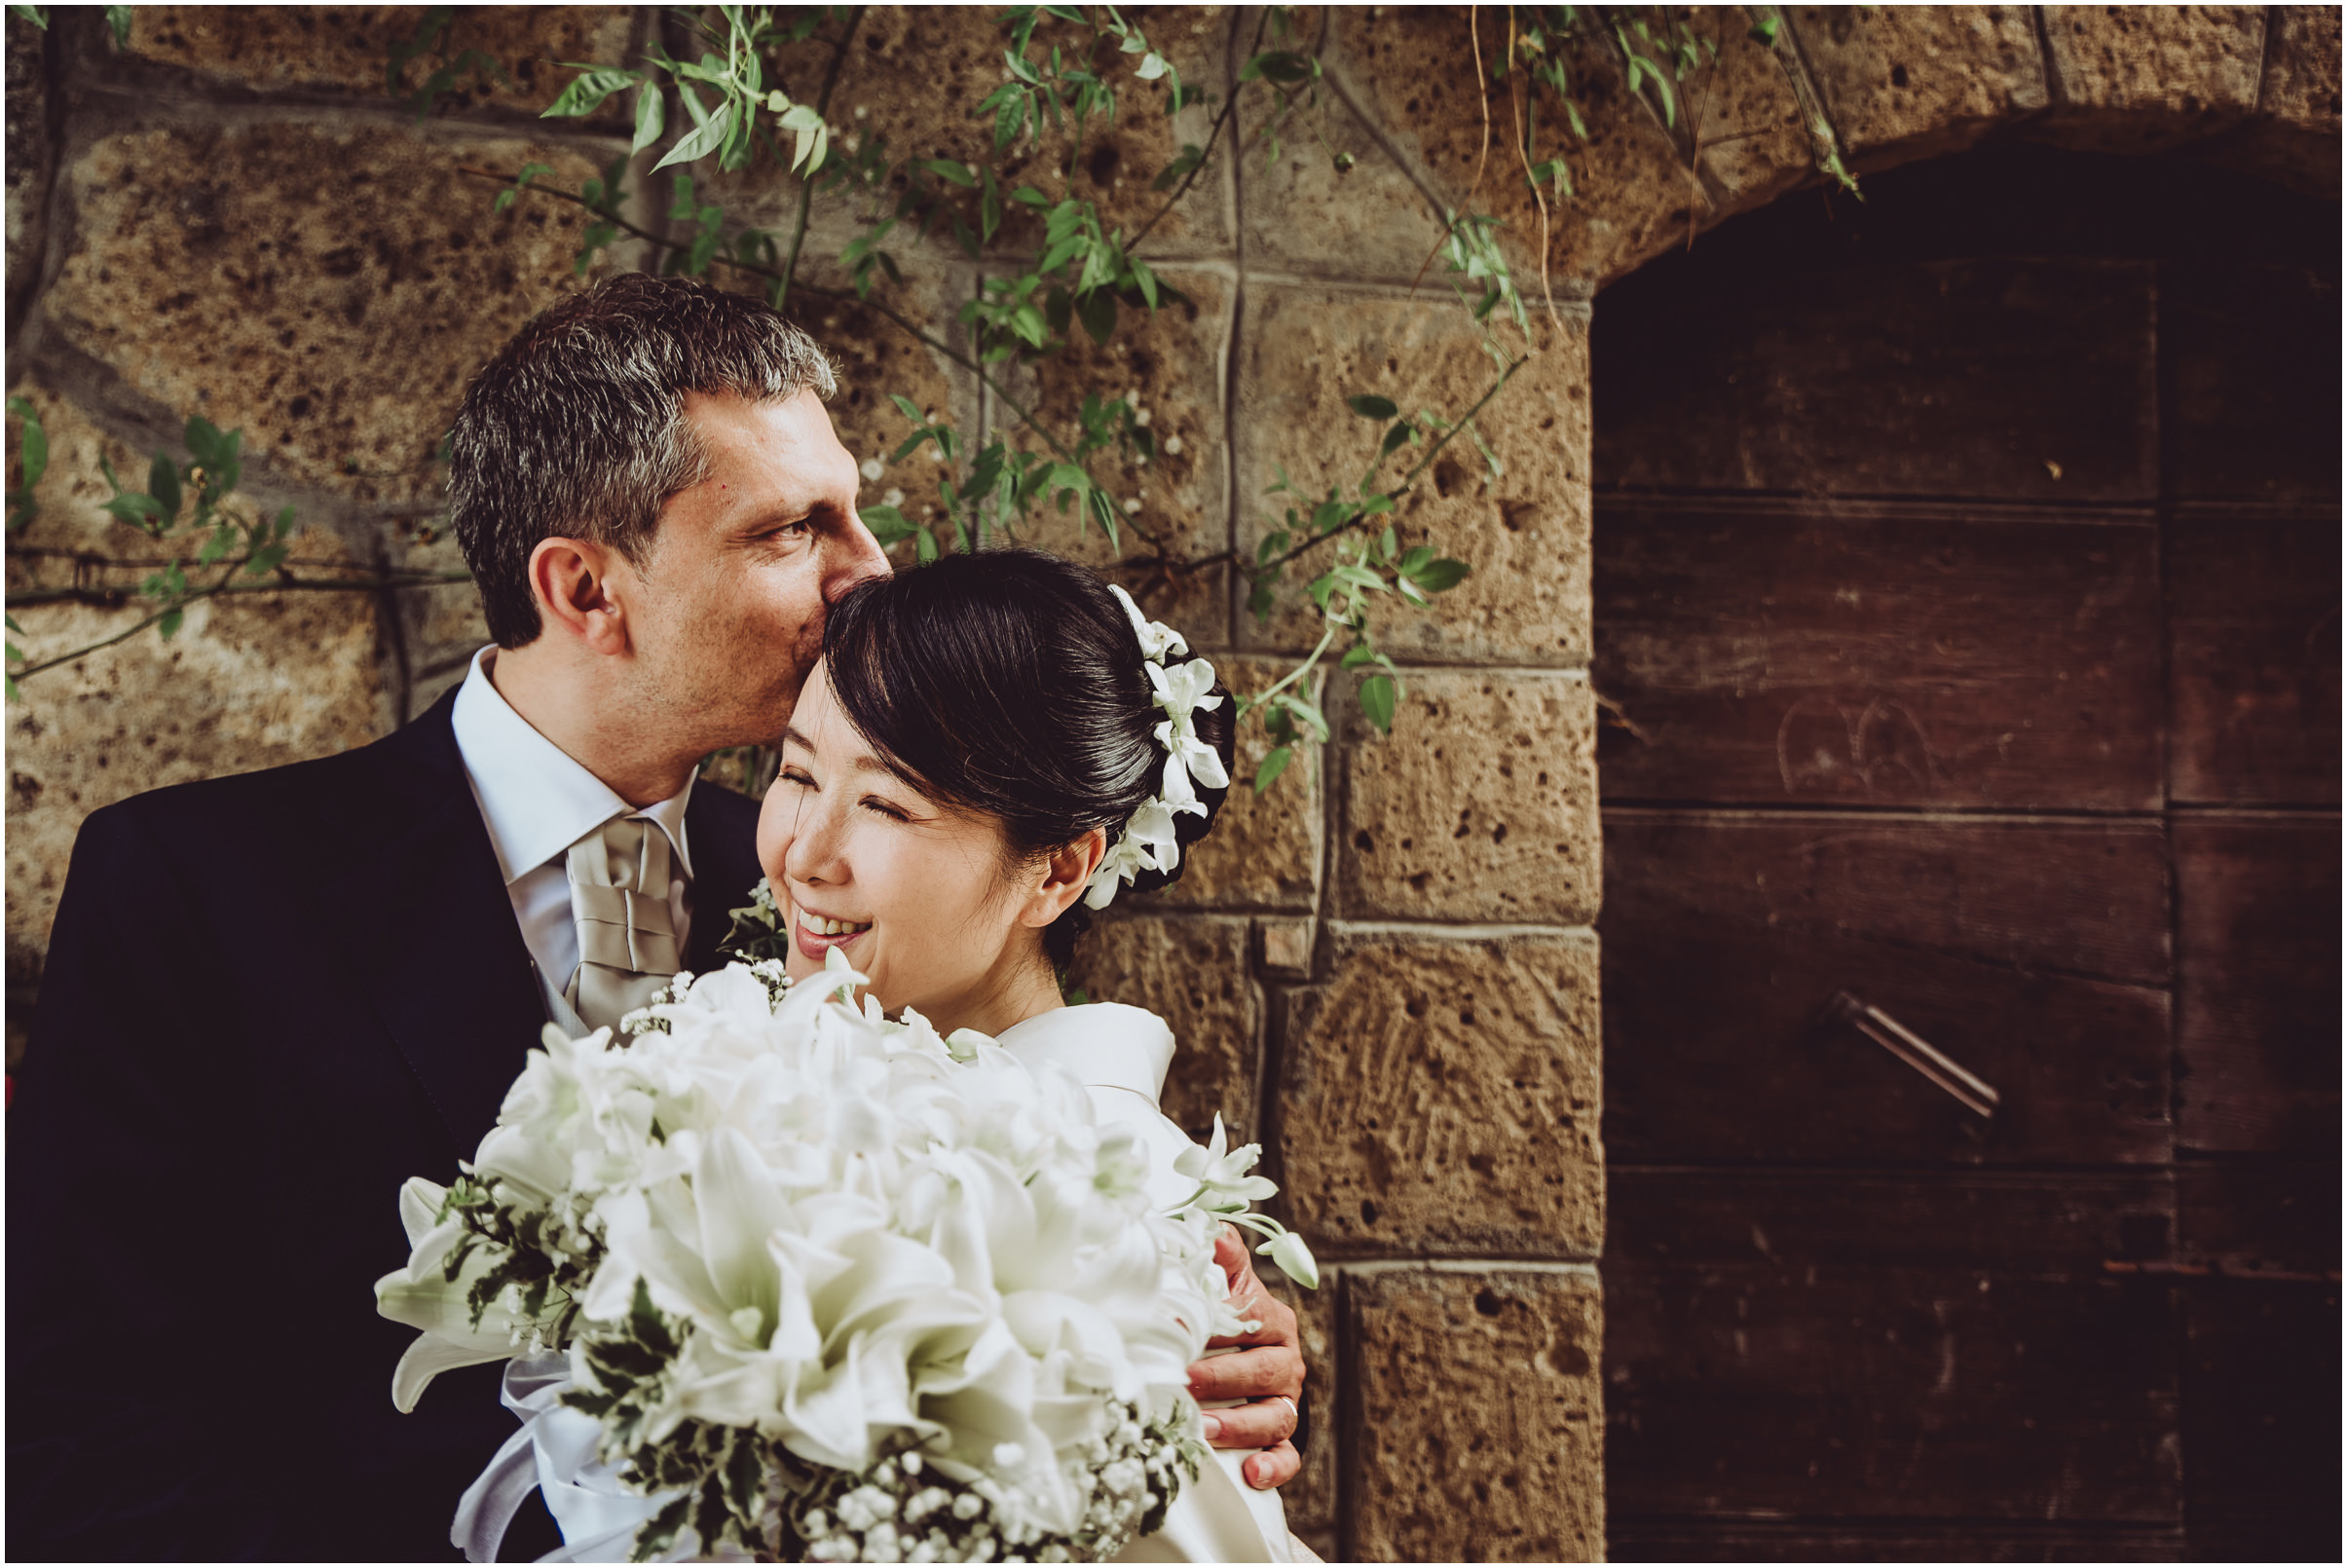 WEDDING-PHOTOGRAPHY-SARA-LORENZONI-FOTOGRAFIA-MATRIMONIO-ORVIETO-JUKA-ANTONELLO39